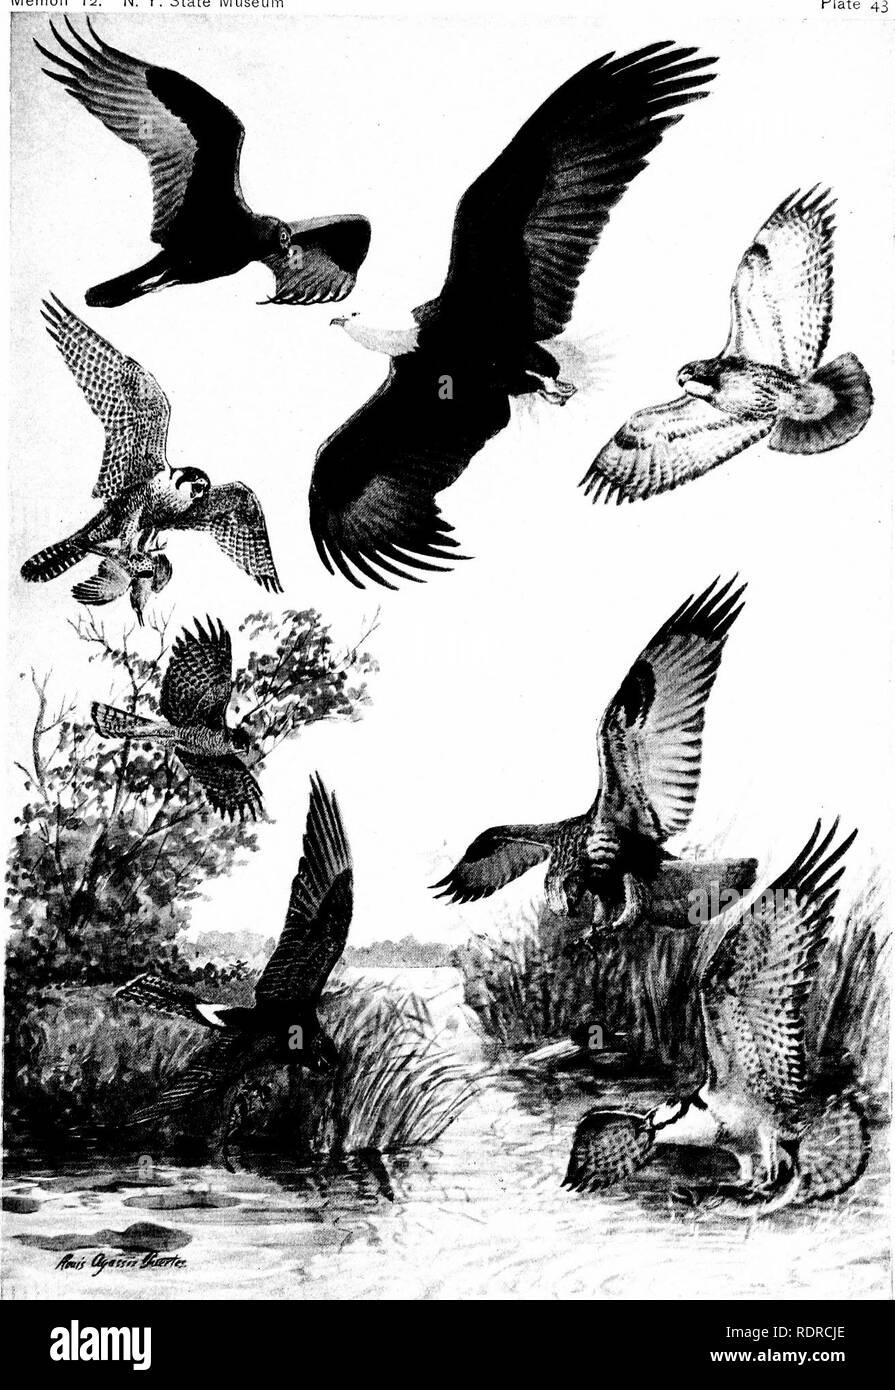 Birds Of New York Birds Memoir 12 N Y State Museu Plate 43 Appearance Of Diurnal Birds Of Prey In Flight Turkey Vulture Falcon Duck Hawk Bald Eagle Buteo Red Tailed Hawkj